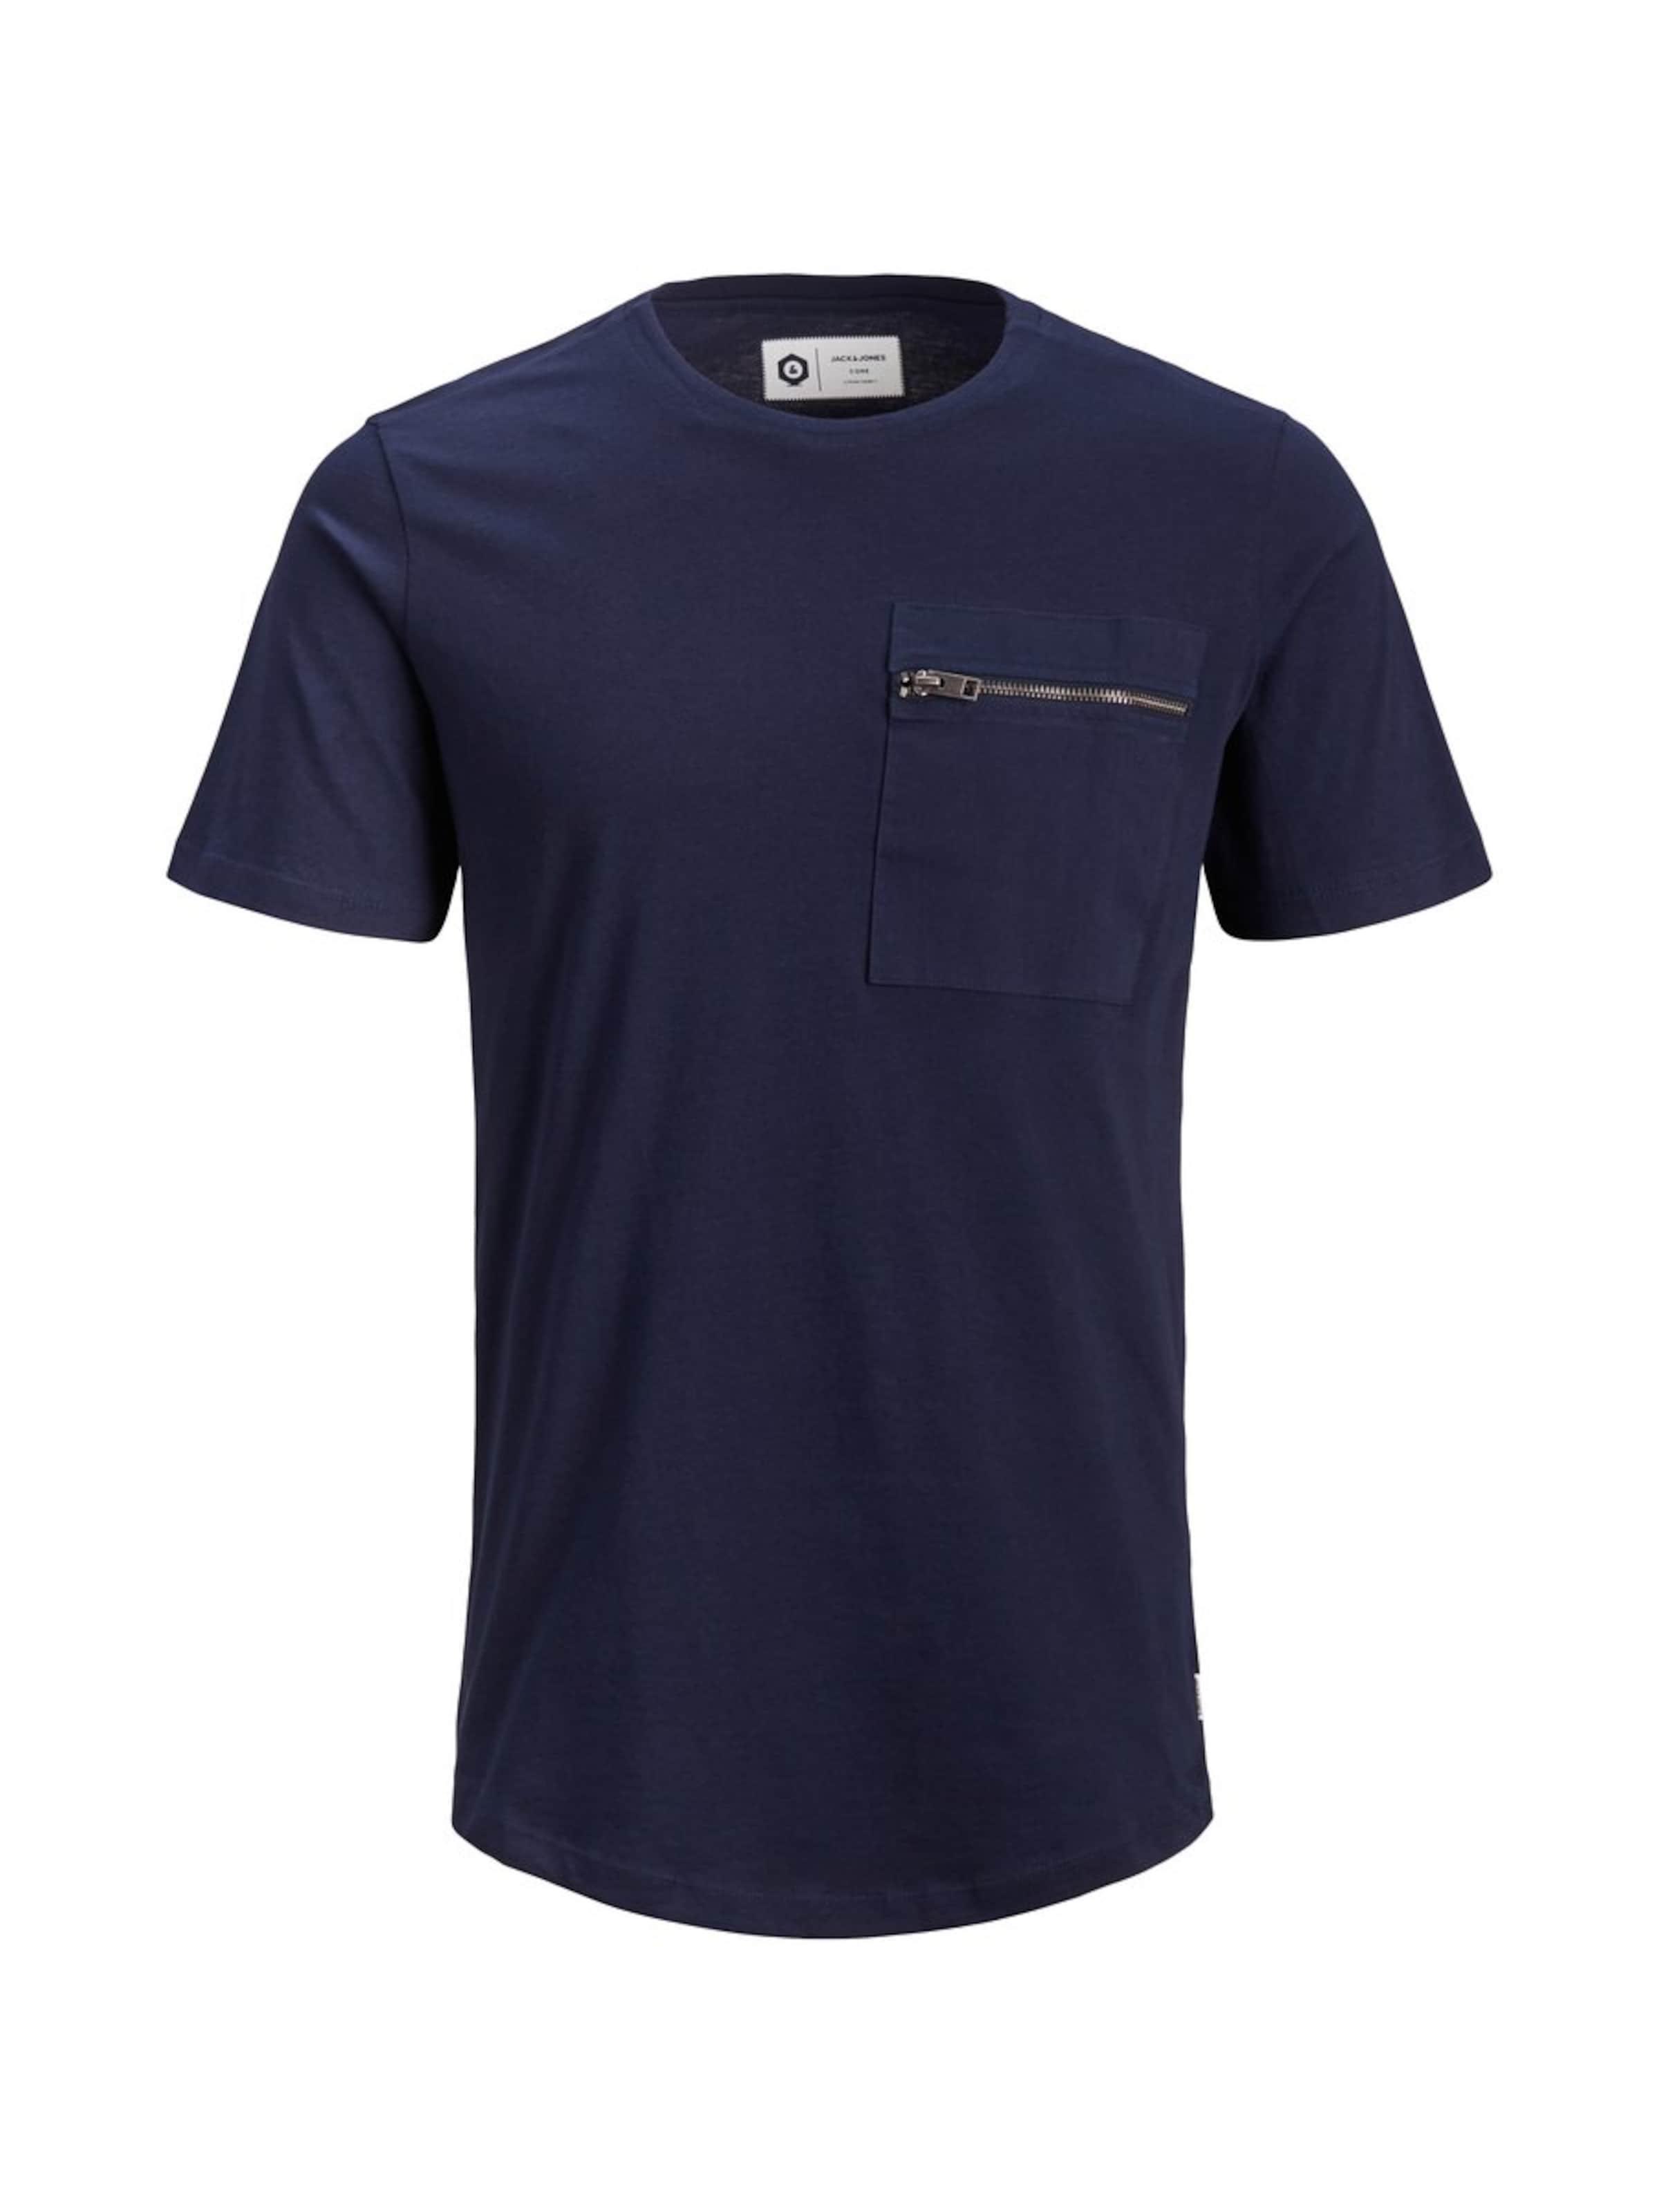 Jackamp; Nachtblau T In Jones shirt cTF1uKJl3